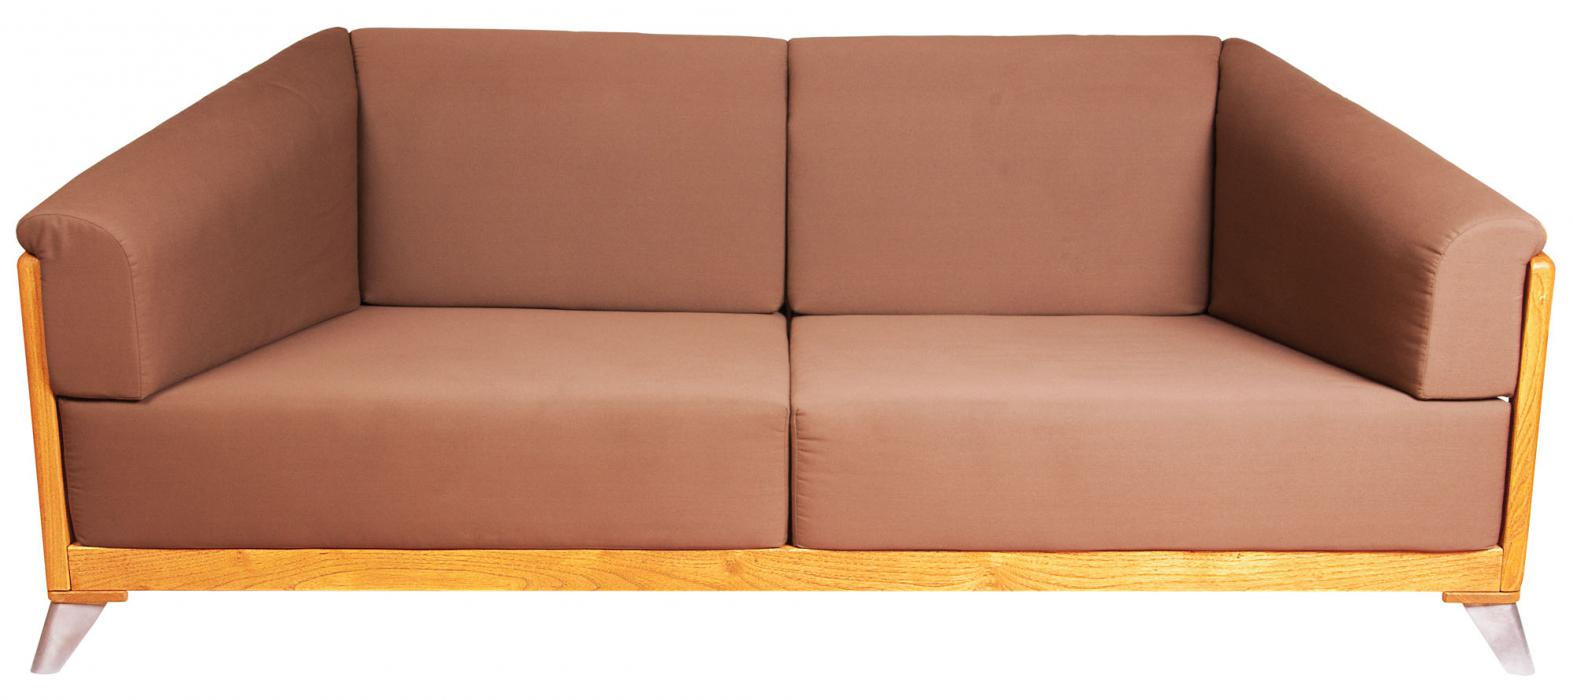 Sofa-Verona-020602